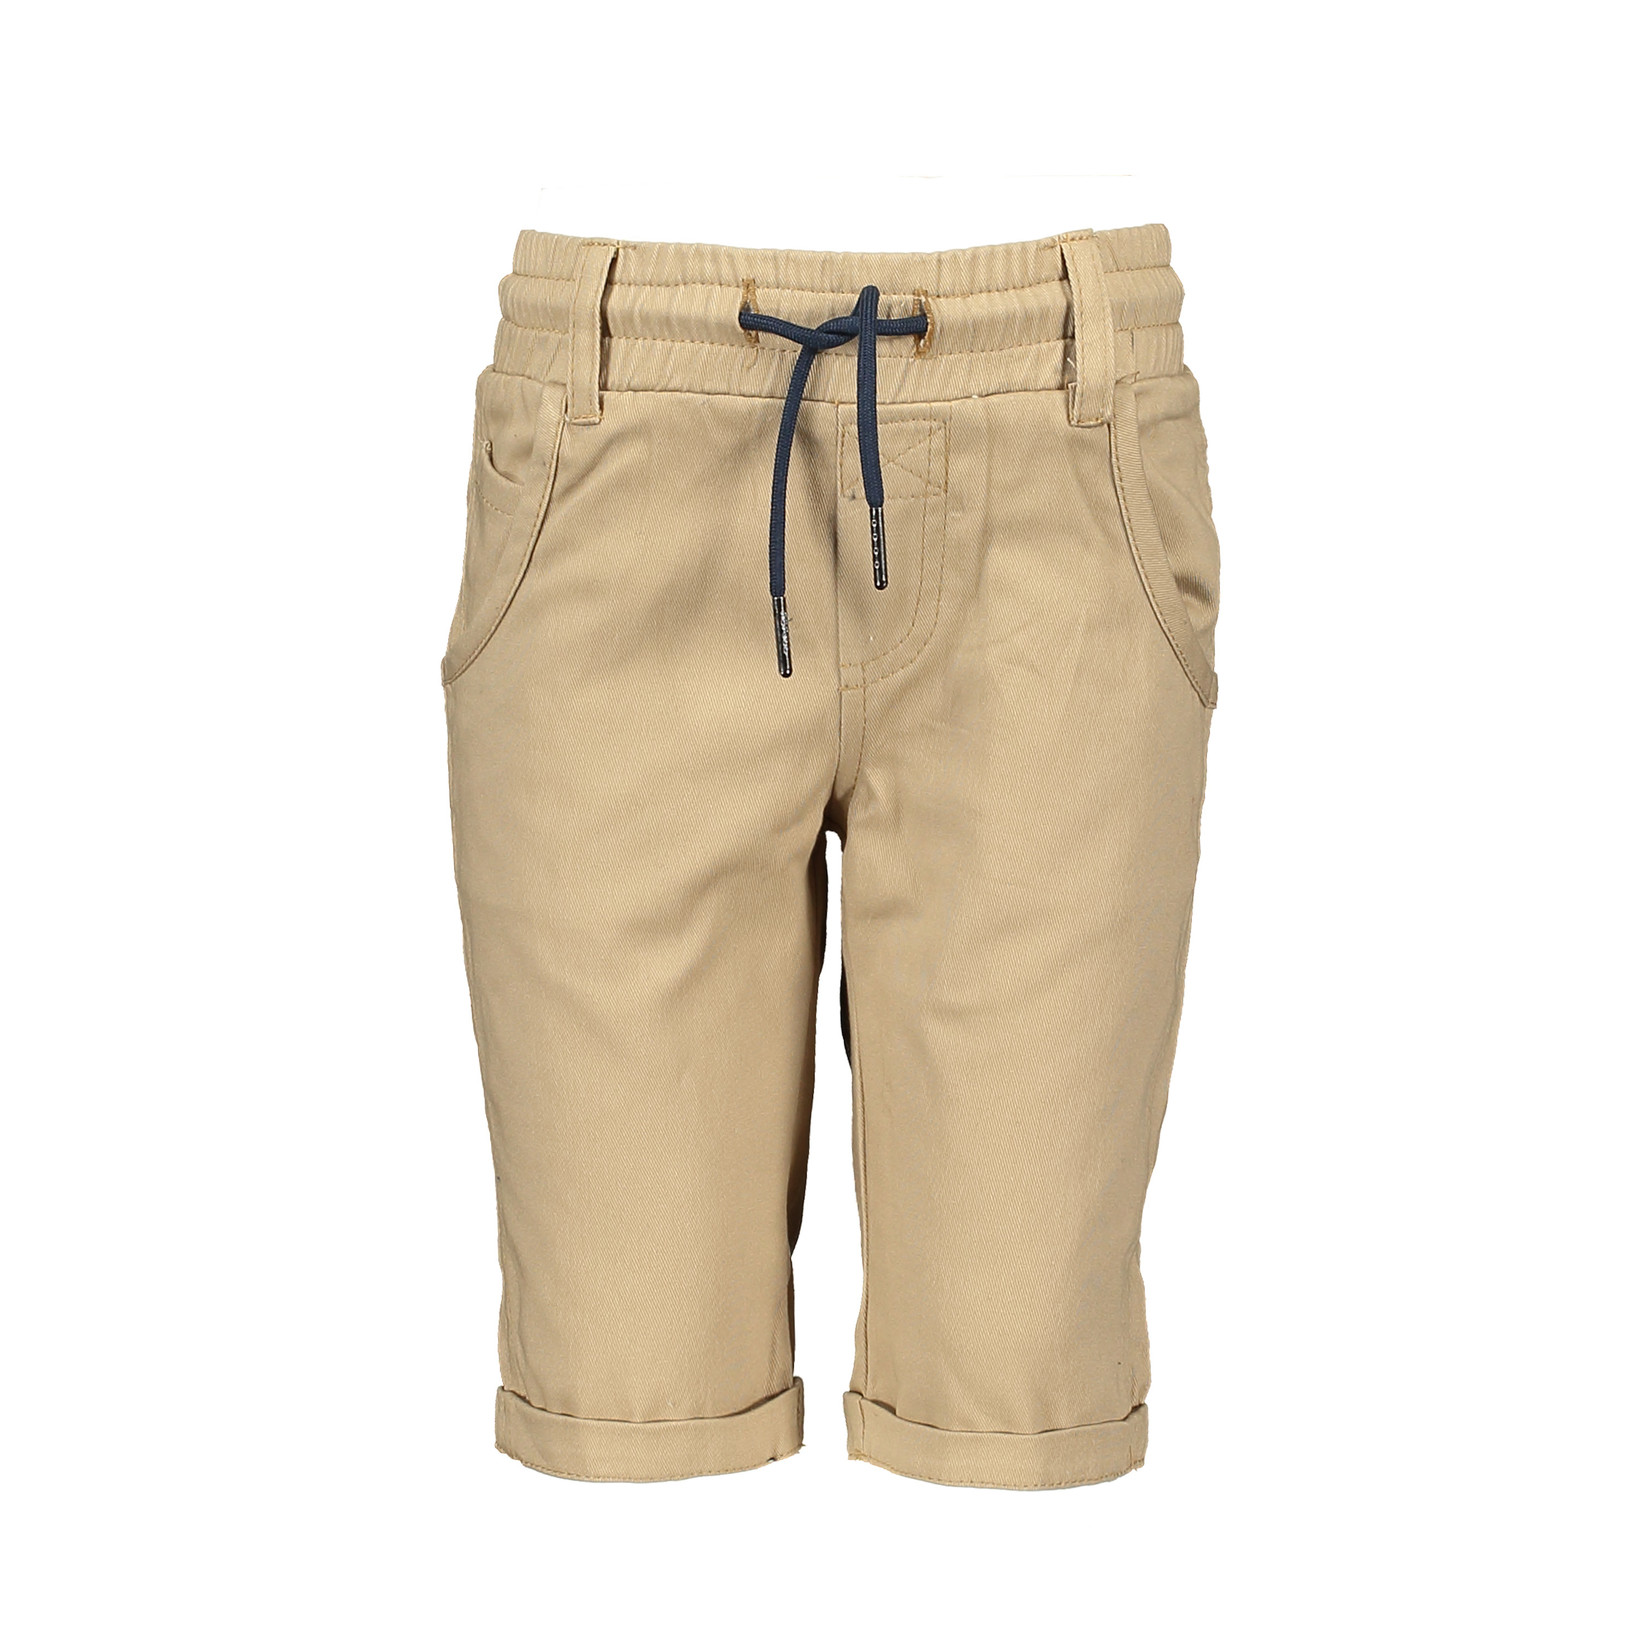 Little Bampidano Boys woven shorts Dorian  with waistcord PLAY baby